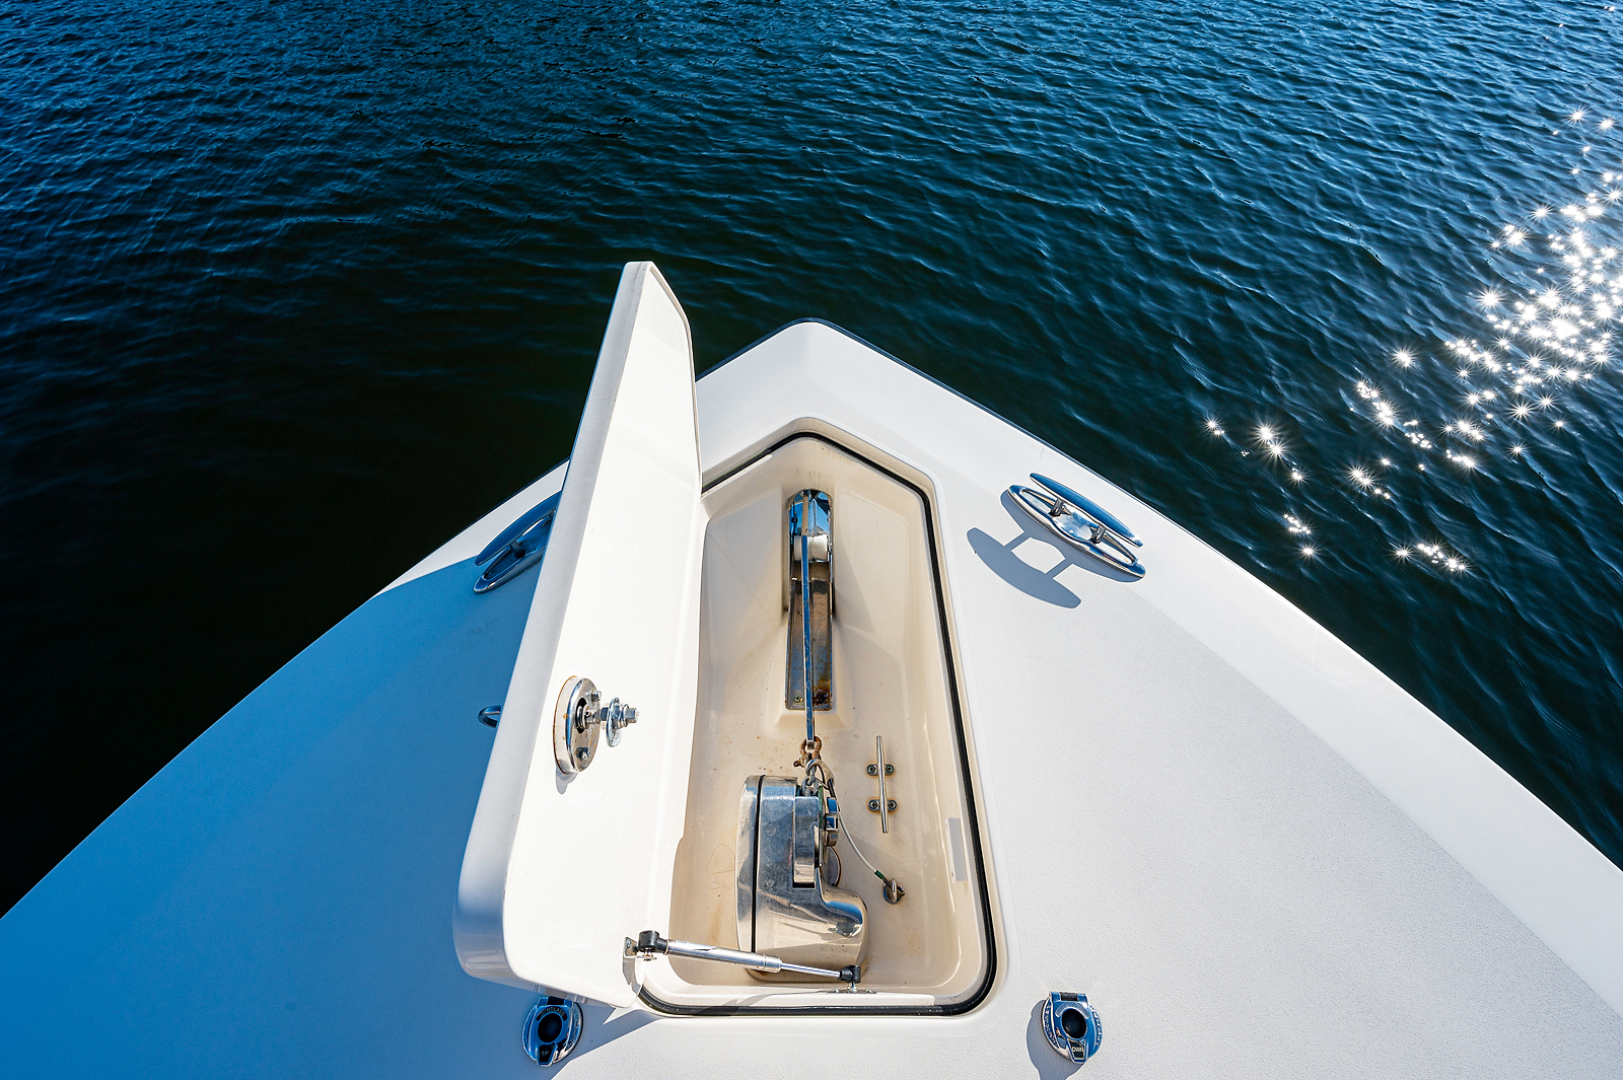 Scout-300 LXF 2017-A Salt Weapon Palm Beach Gardens-Florida-United States-Anchor Locker with Windlass-1571058 | Thumbnail